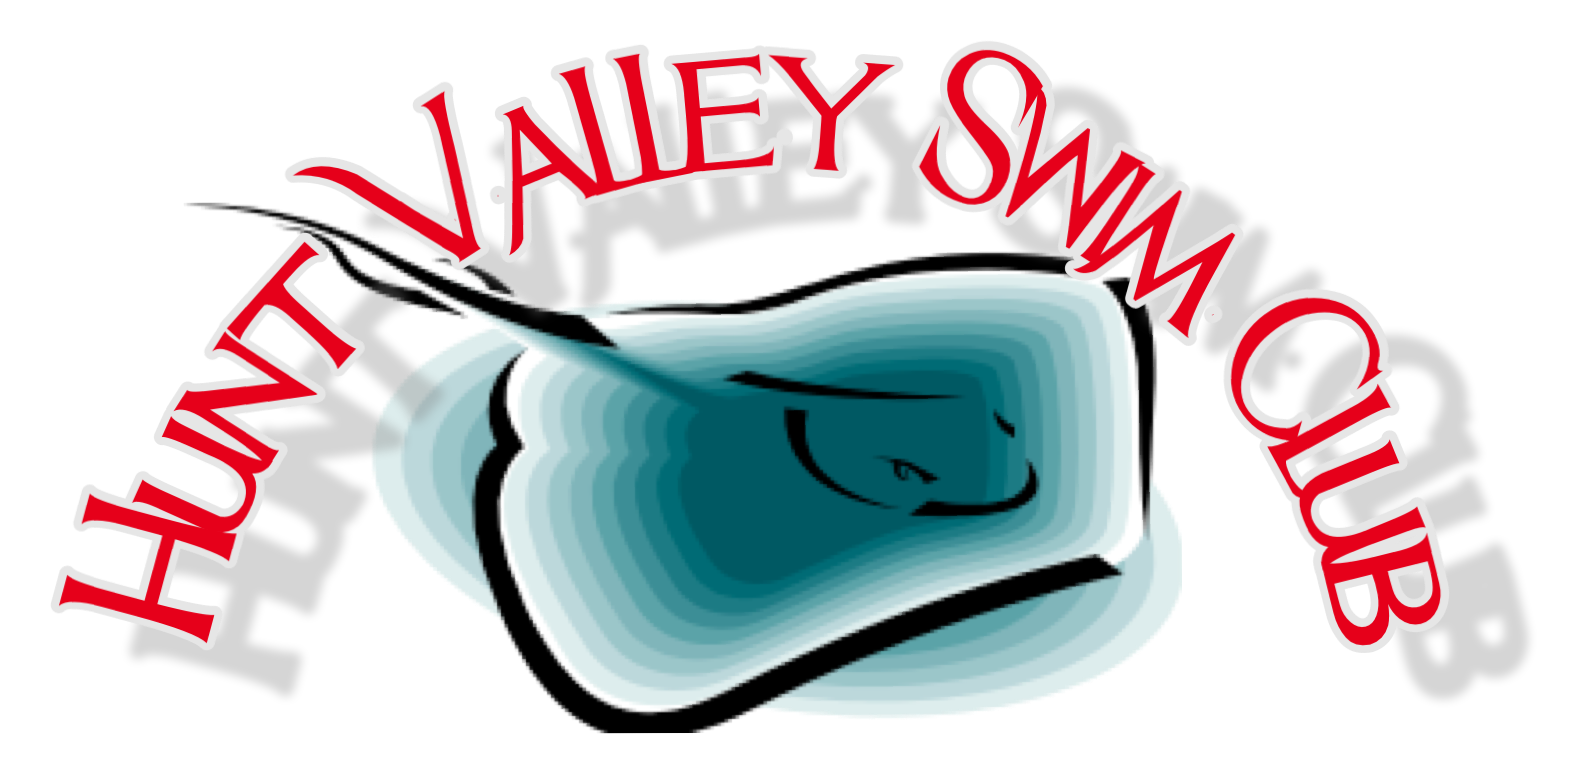 1571x783 Hunt Valley Swim Club Powered By Member Splash